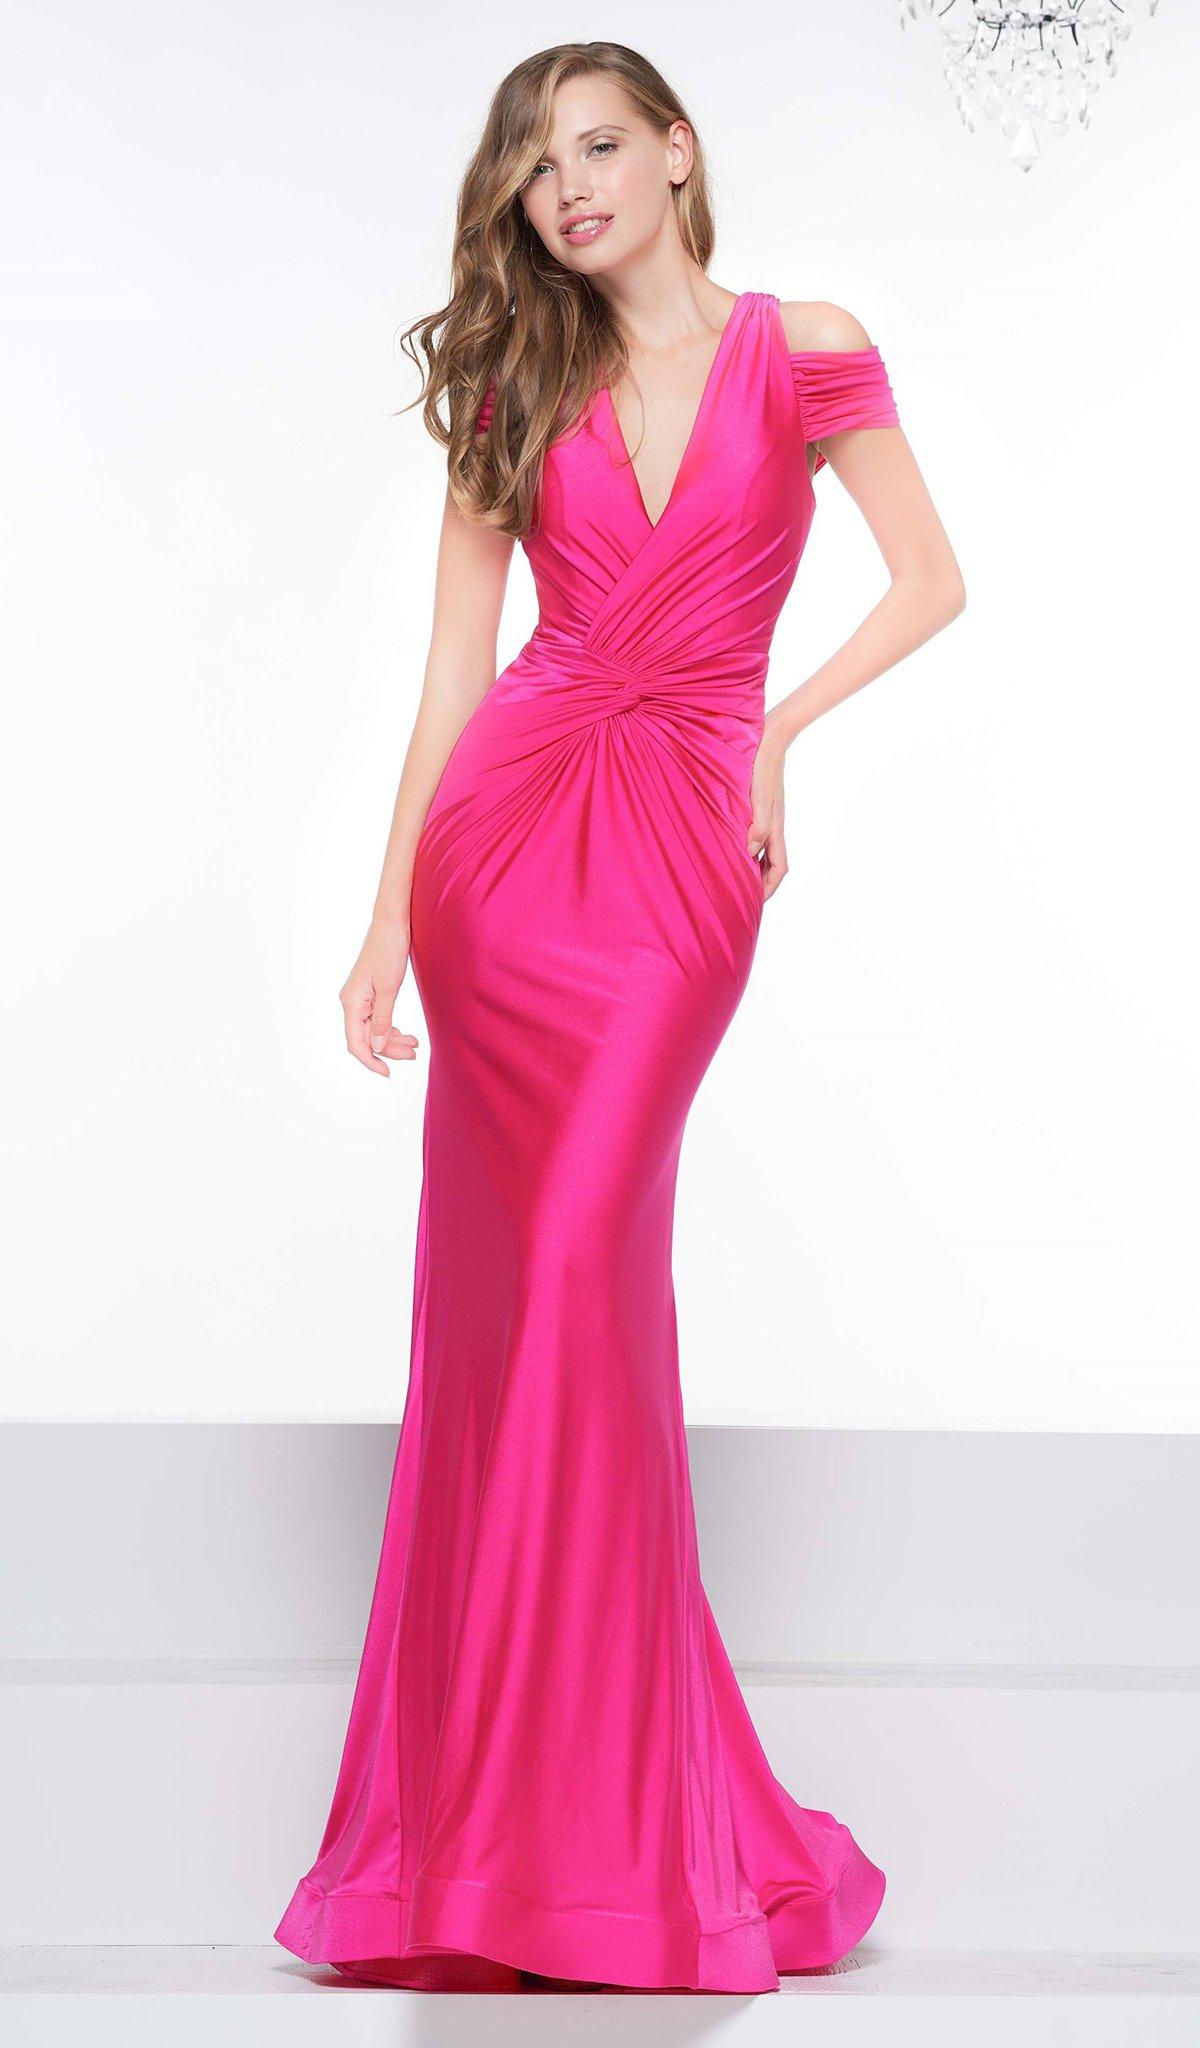 Colors Dress - 2103 V Neck Cold Shoulder Knotted Satin Mermaid Gown